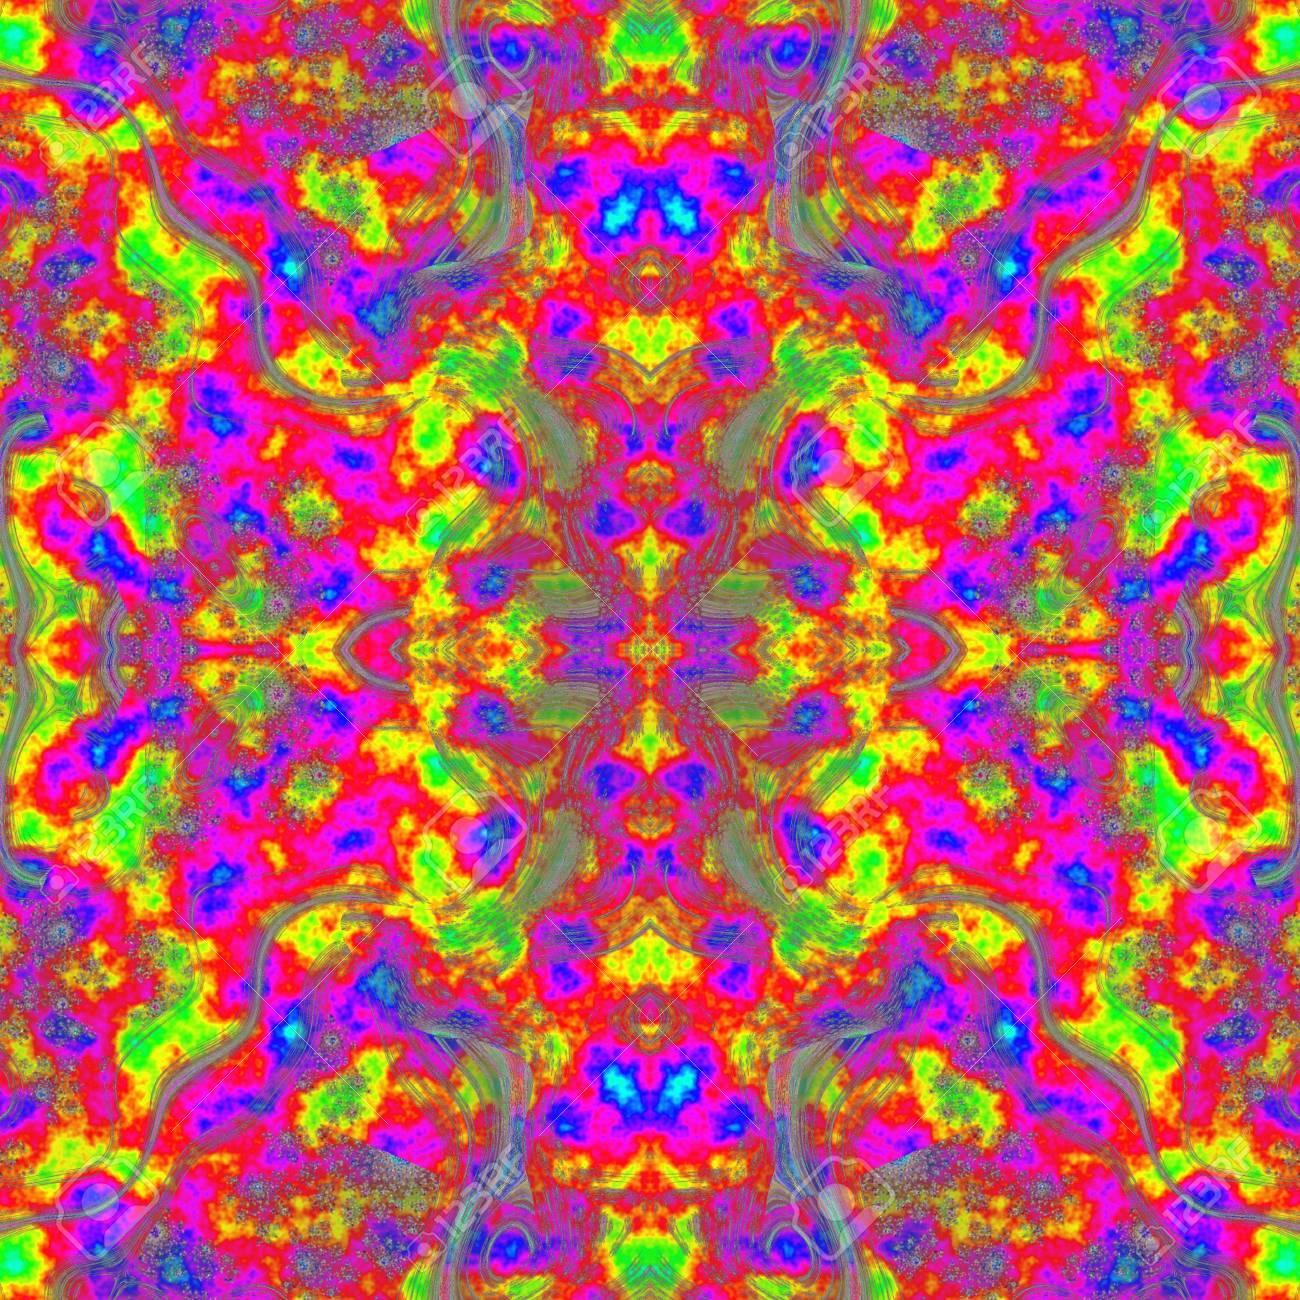 colorful kaleidoscopic positive energetic amazing bright image stock rh 123rf com